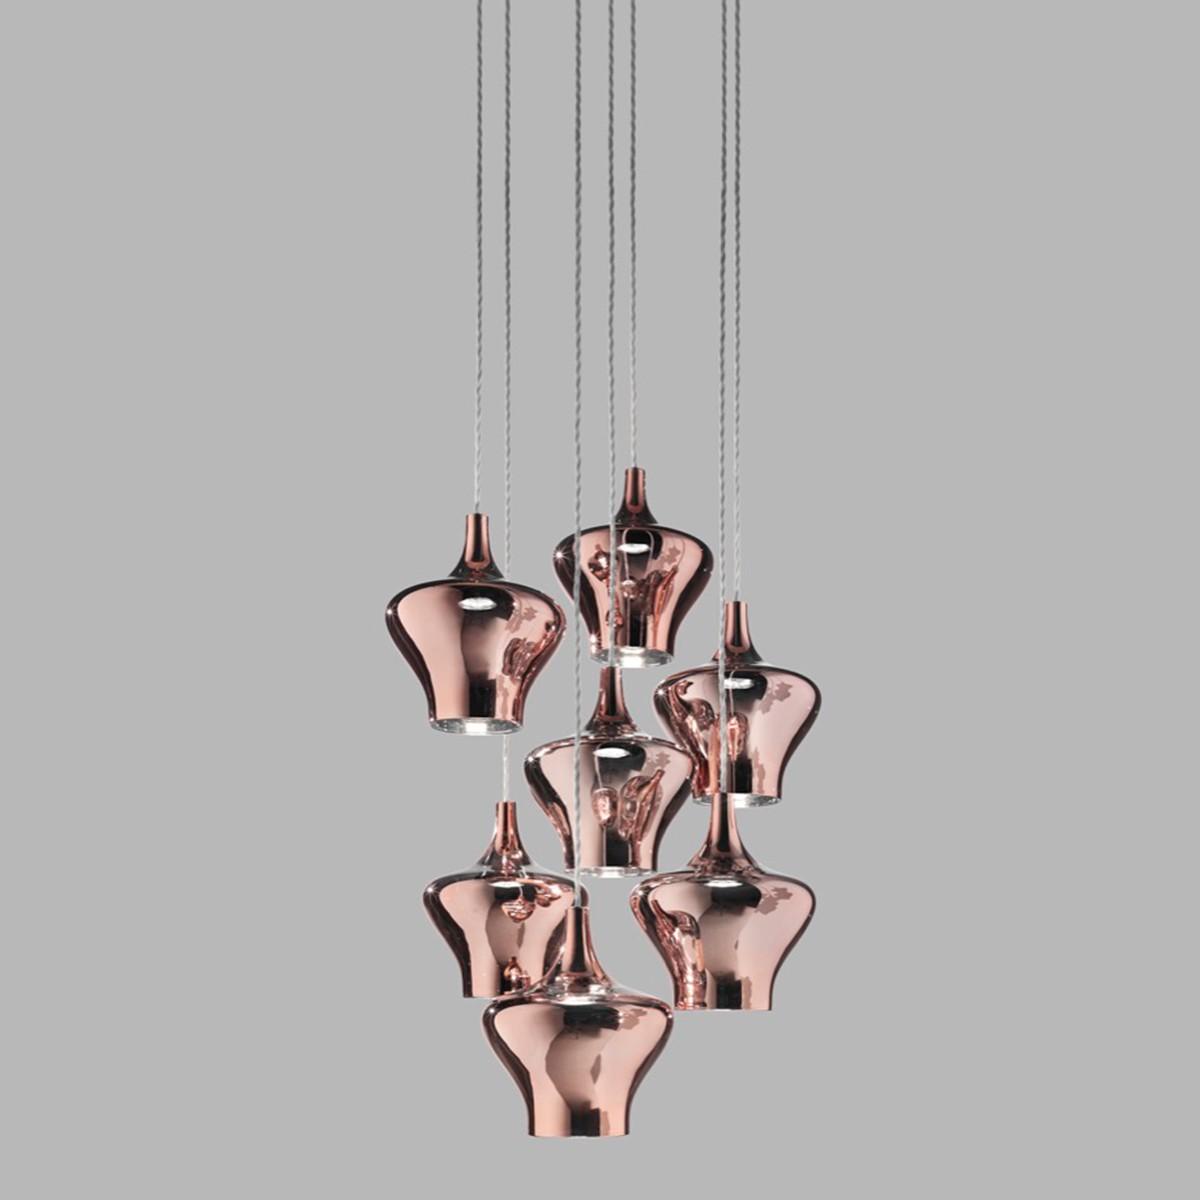 Studio Italia Design Nostalgia Glas Medium Pendelleuchte 7-flg., Chrom - Rose Gold